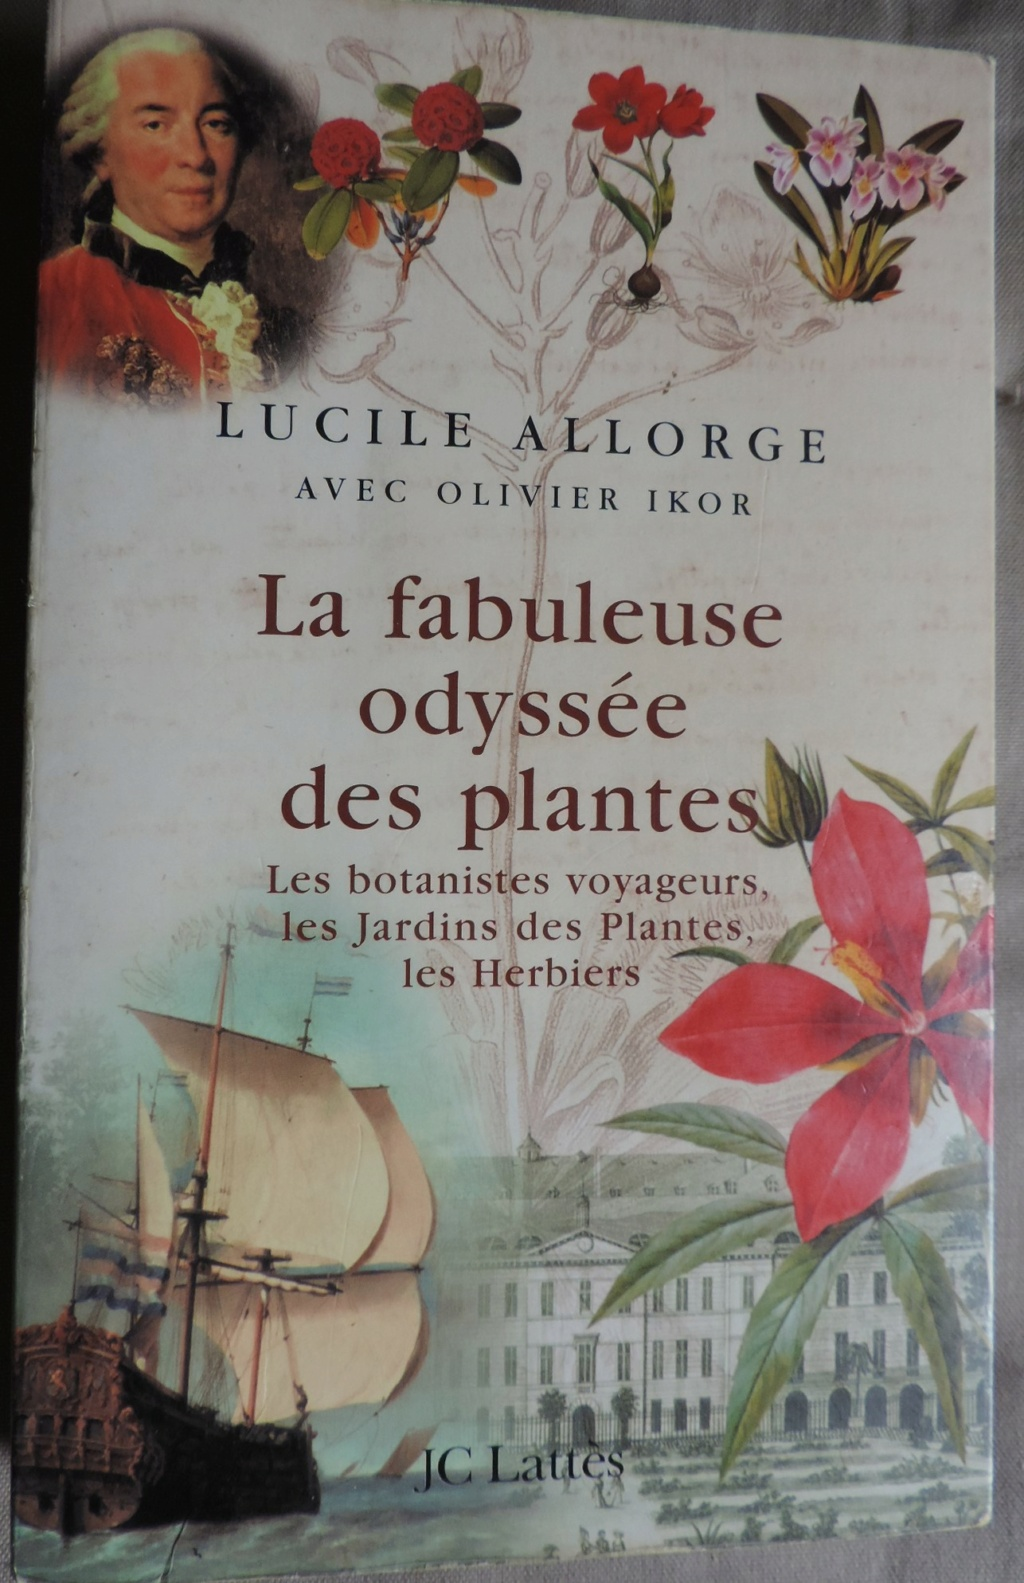 Les botanistes  - Page 8 Dscn9199